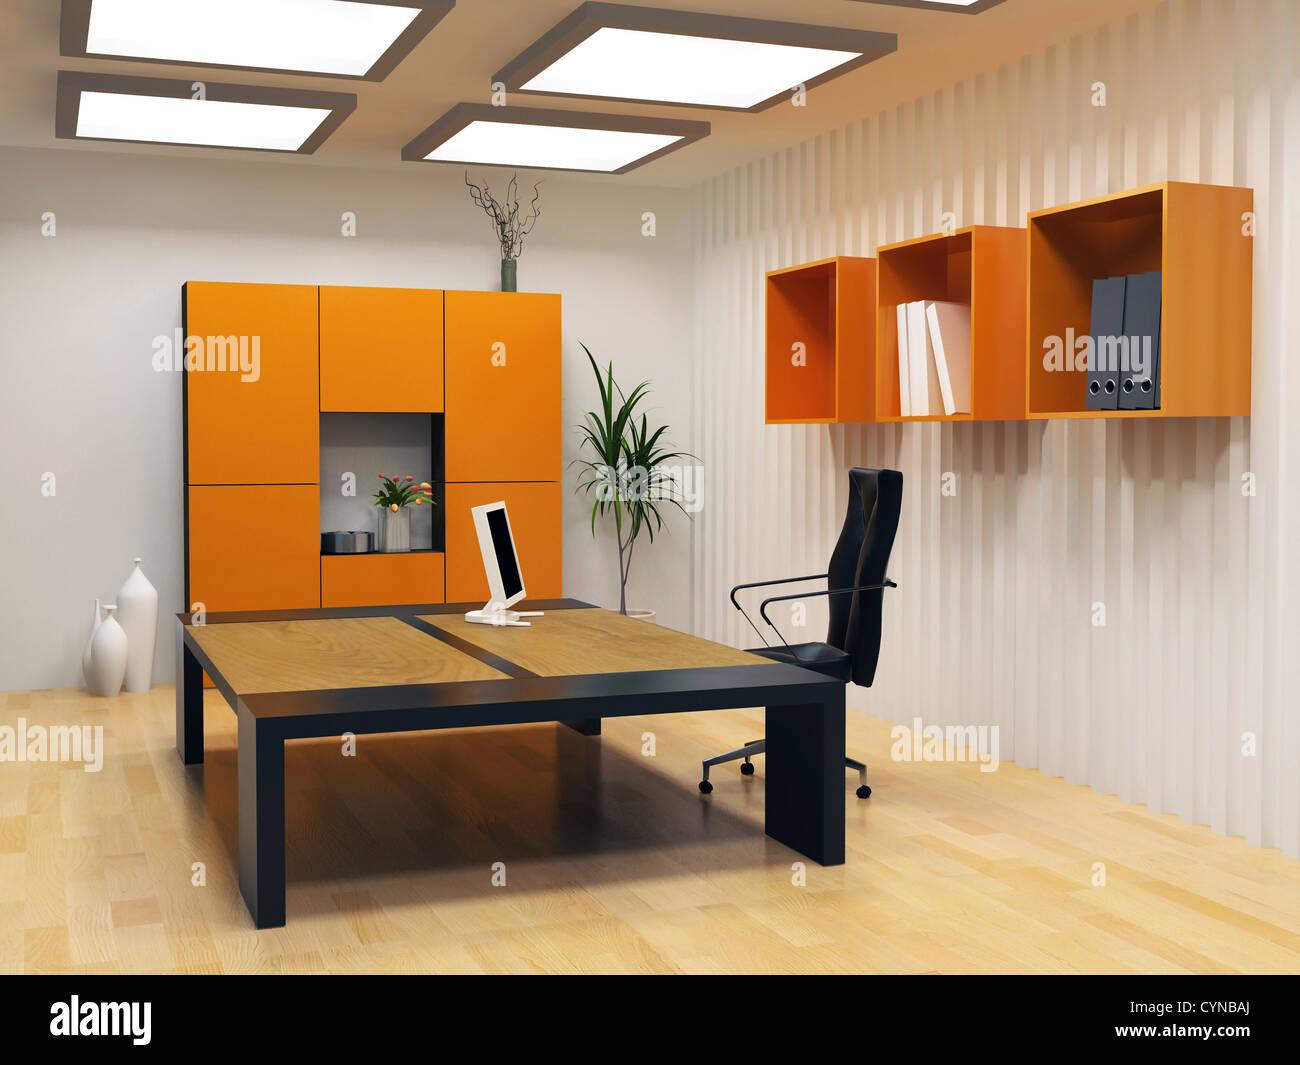 Diseño de interiores moderno jefe de gabinete room(3D Render) Imagen De Stock